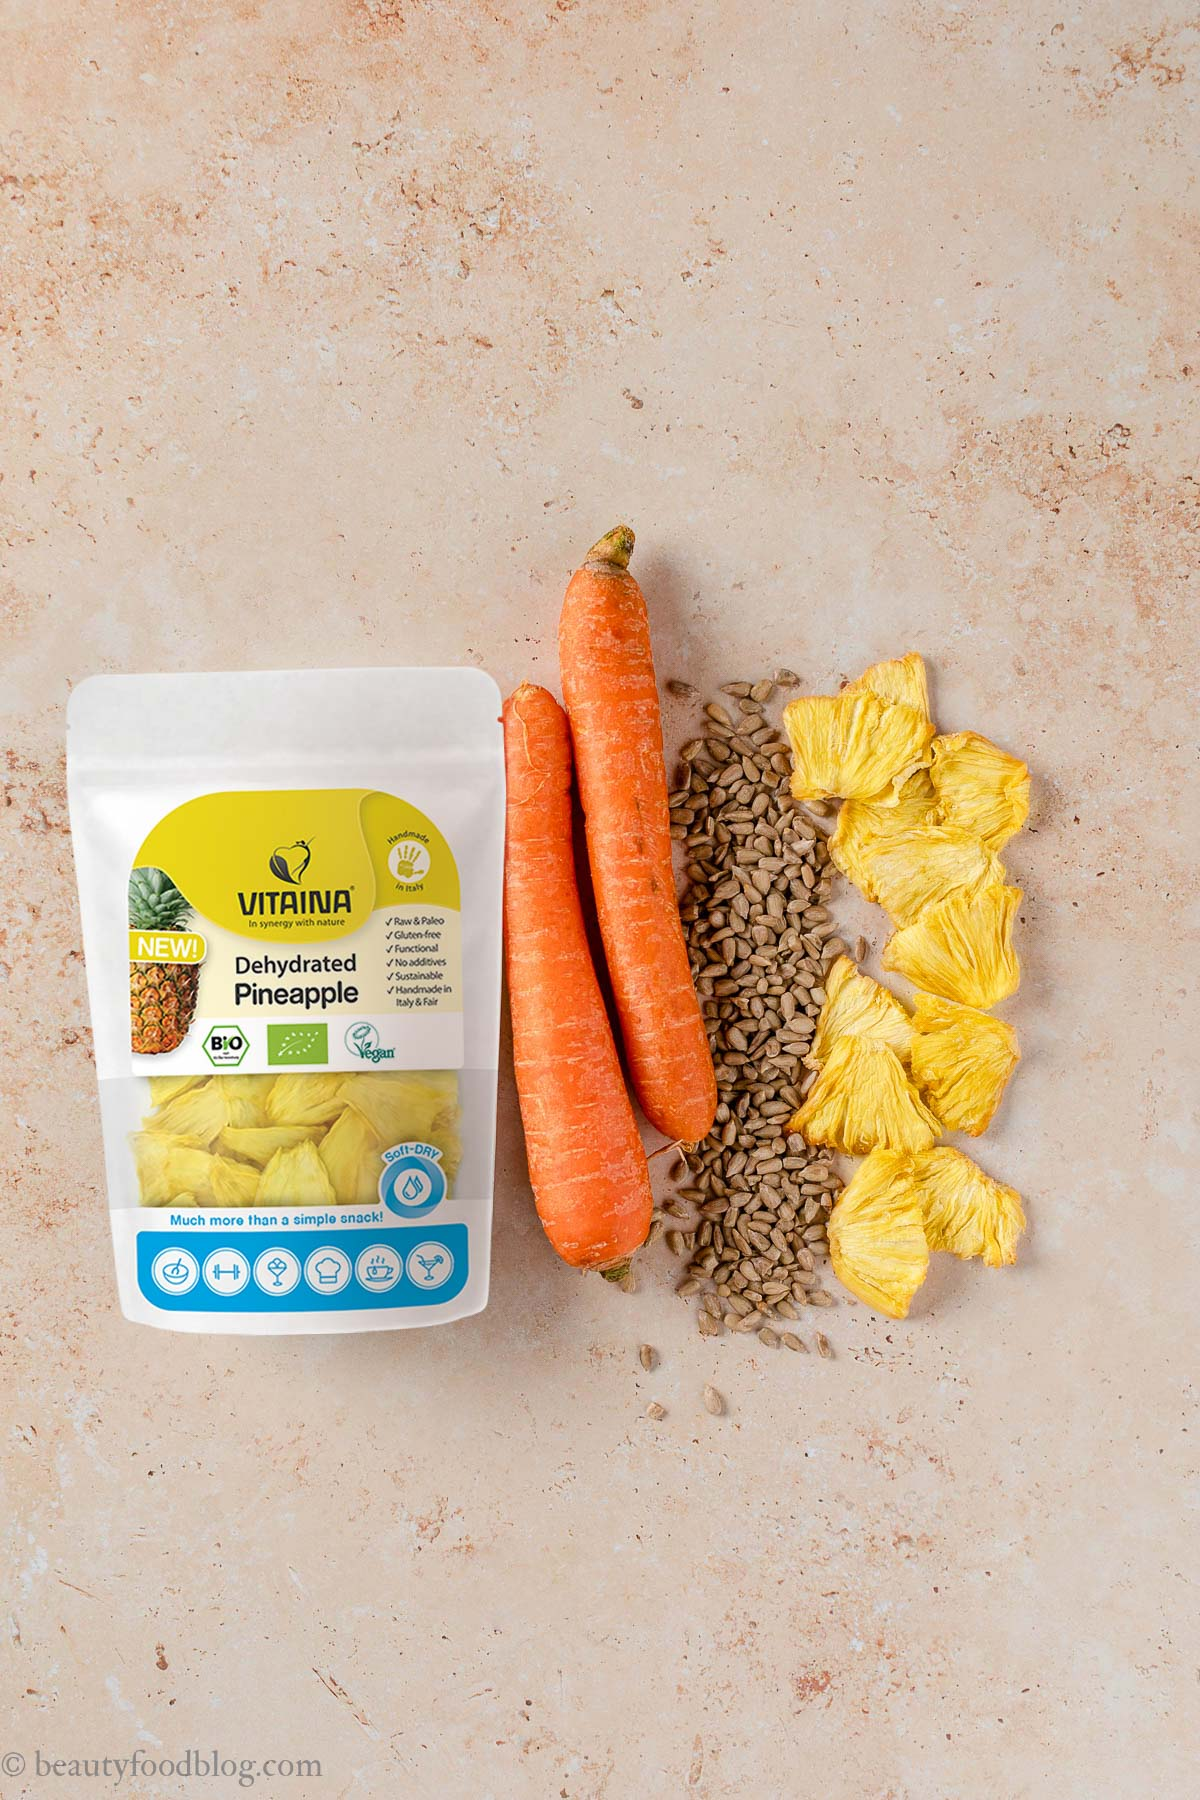 ricetta energy balls alle carote senza frutta secca senza zuccheri aggiunti no-bake nut-free vegan carrot cake bites bliss balls recipe Vitaina